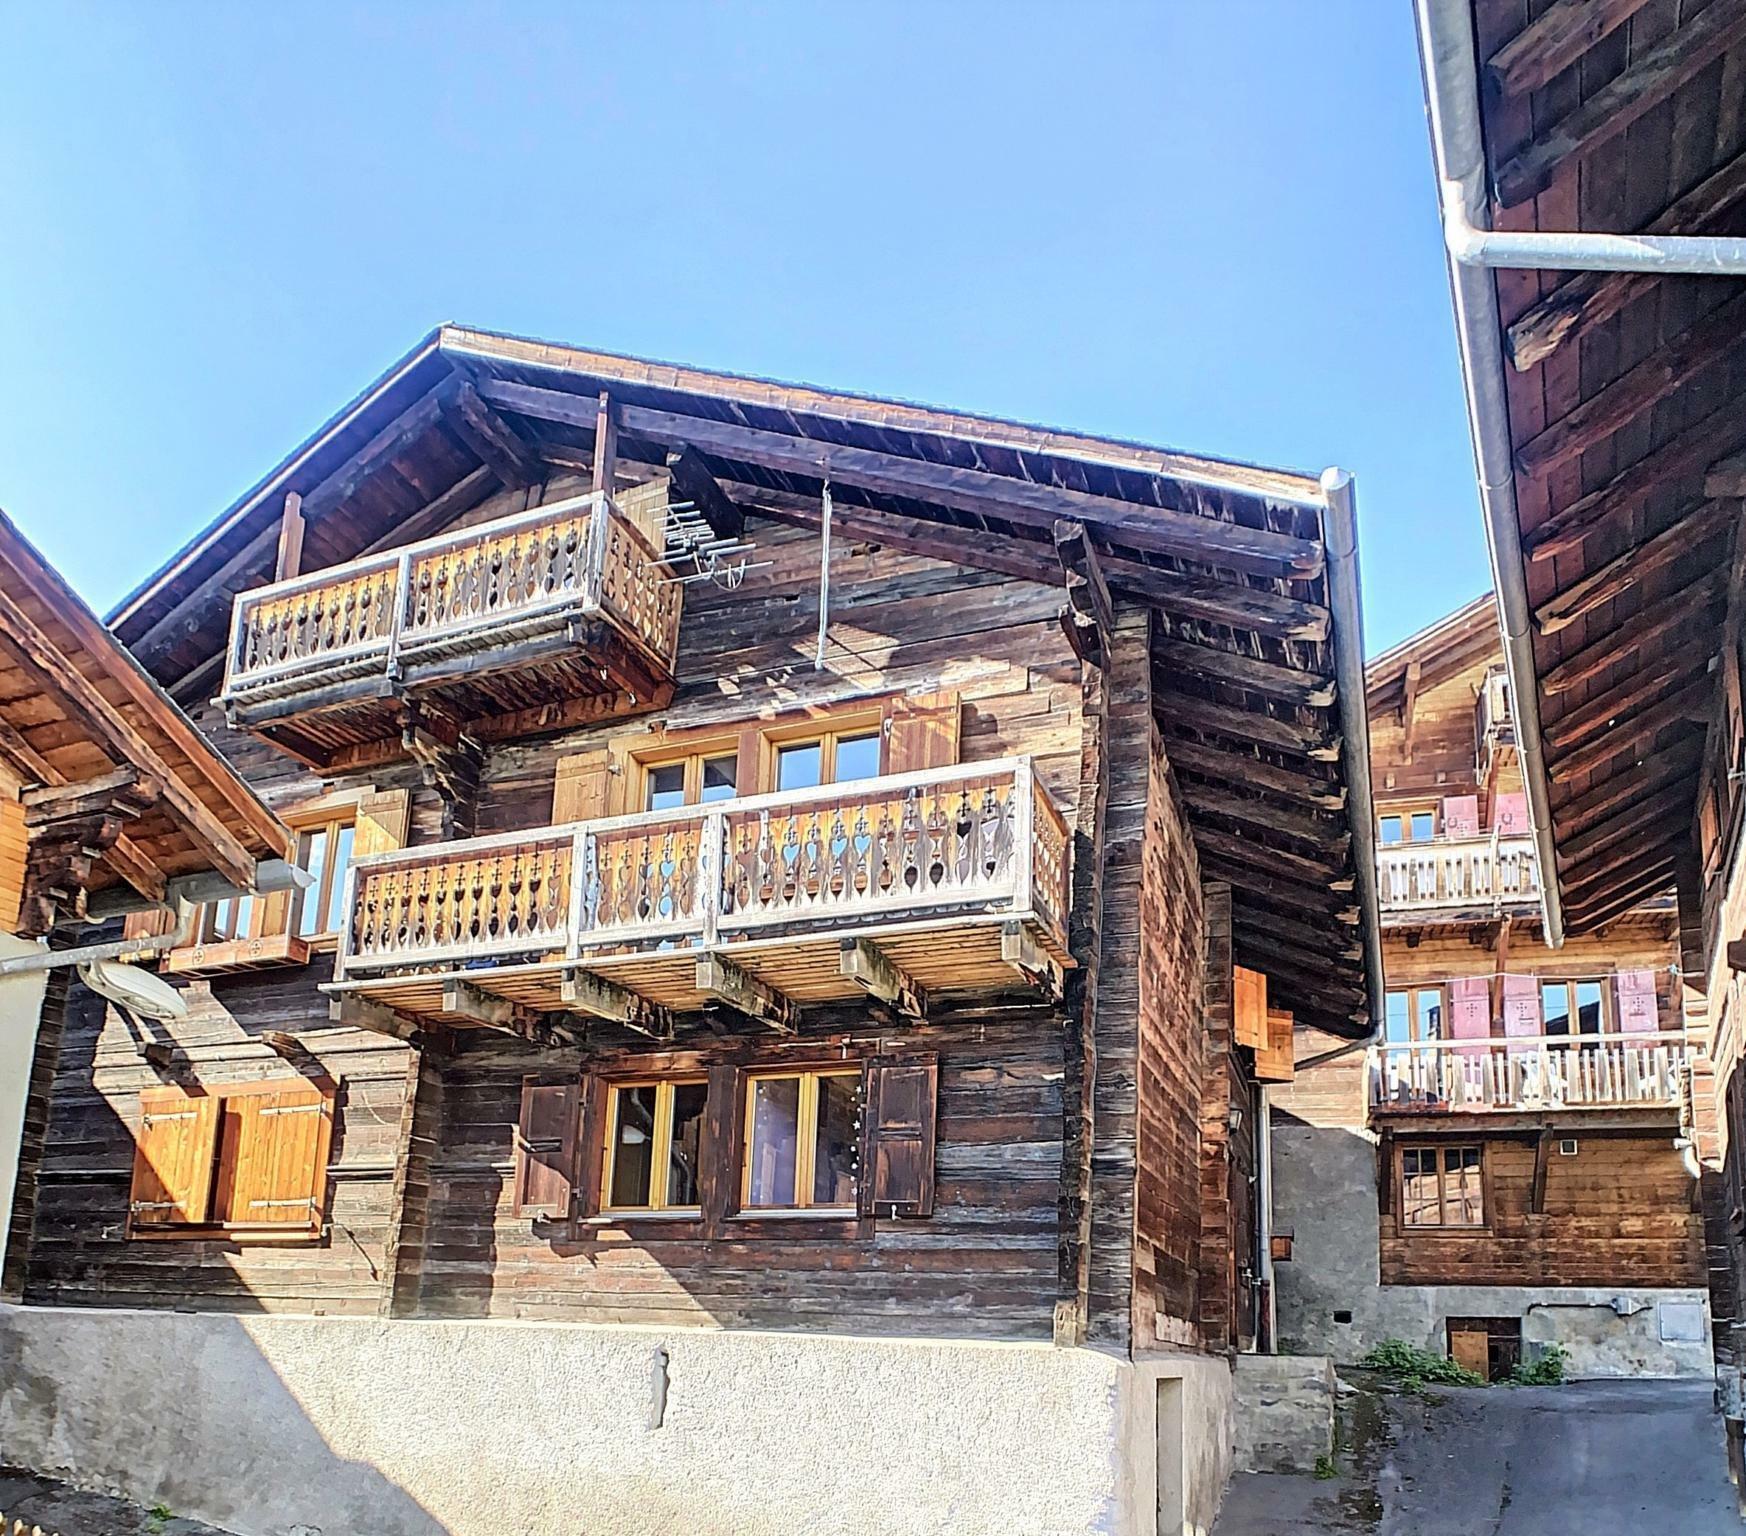 Chalet in Bagnes, Valais, Switzerland 1